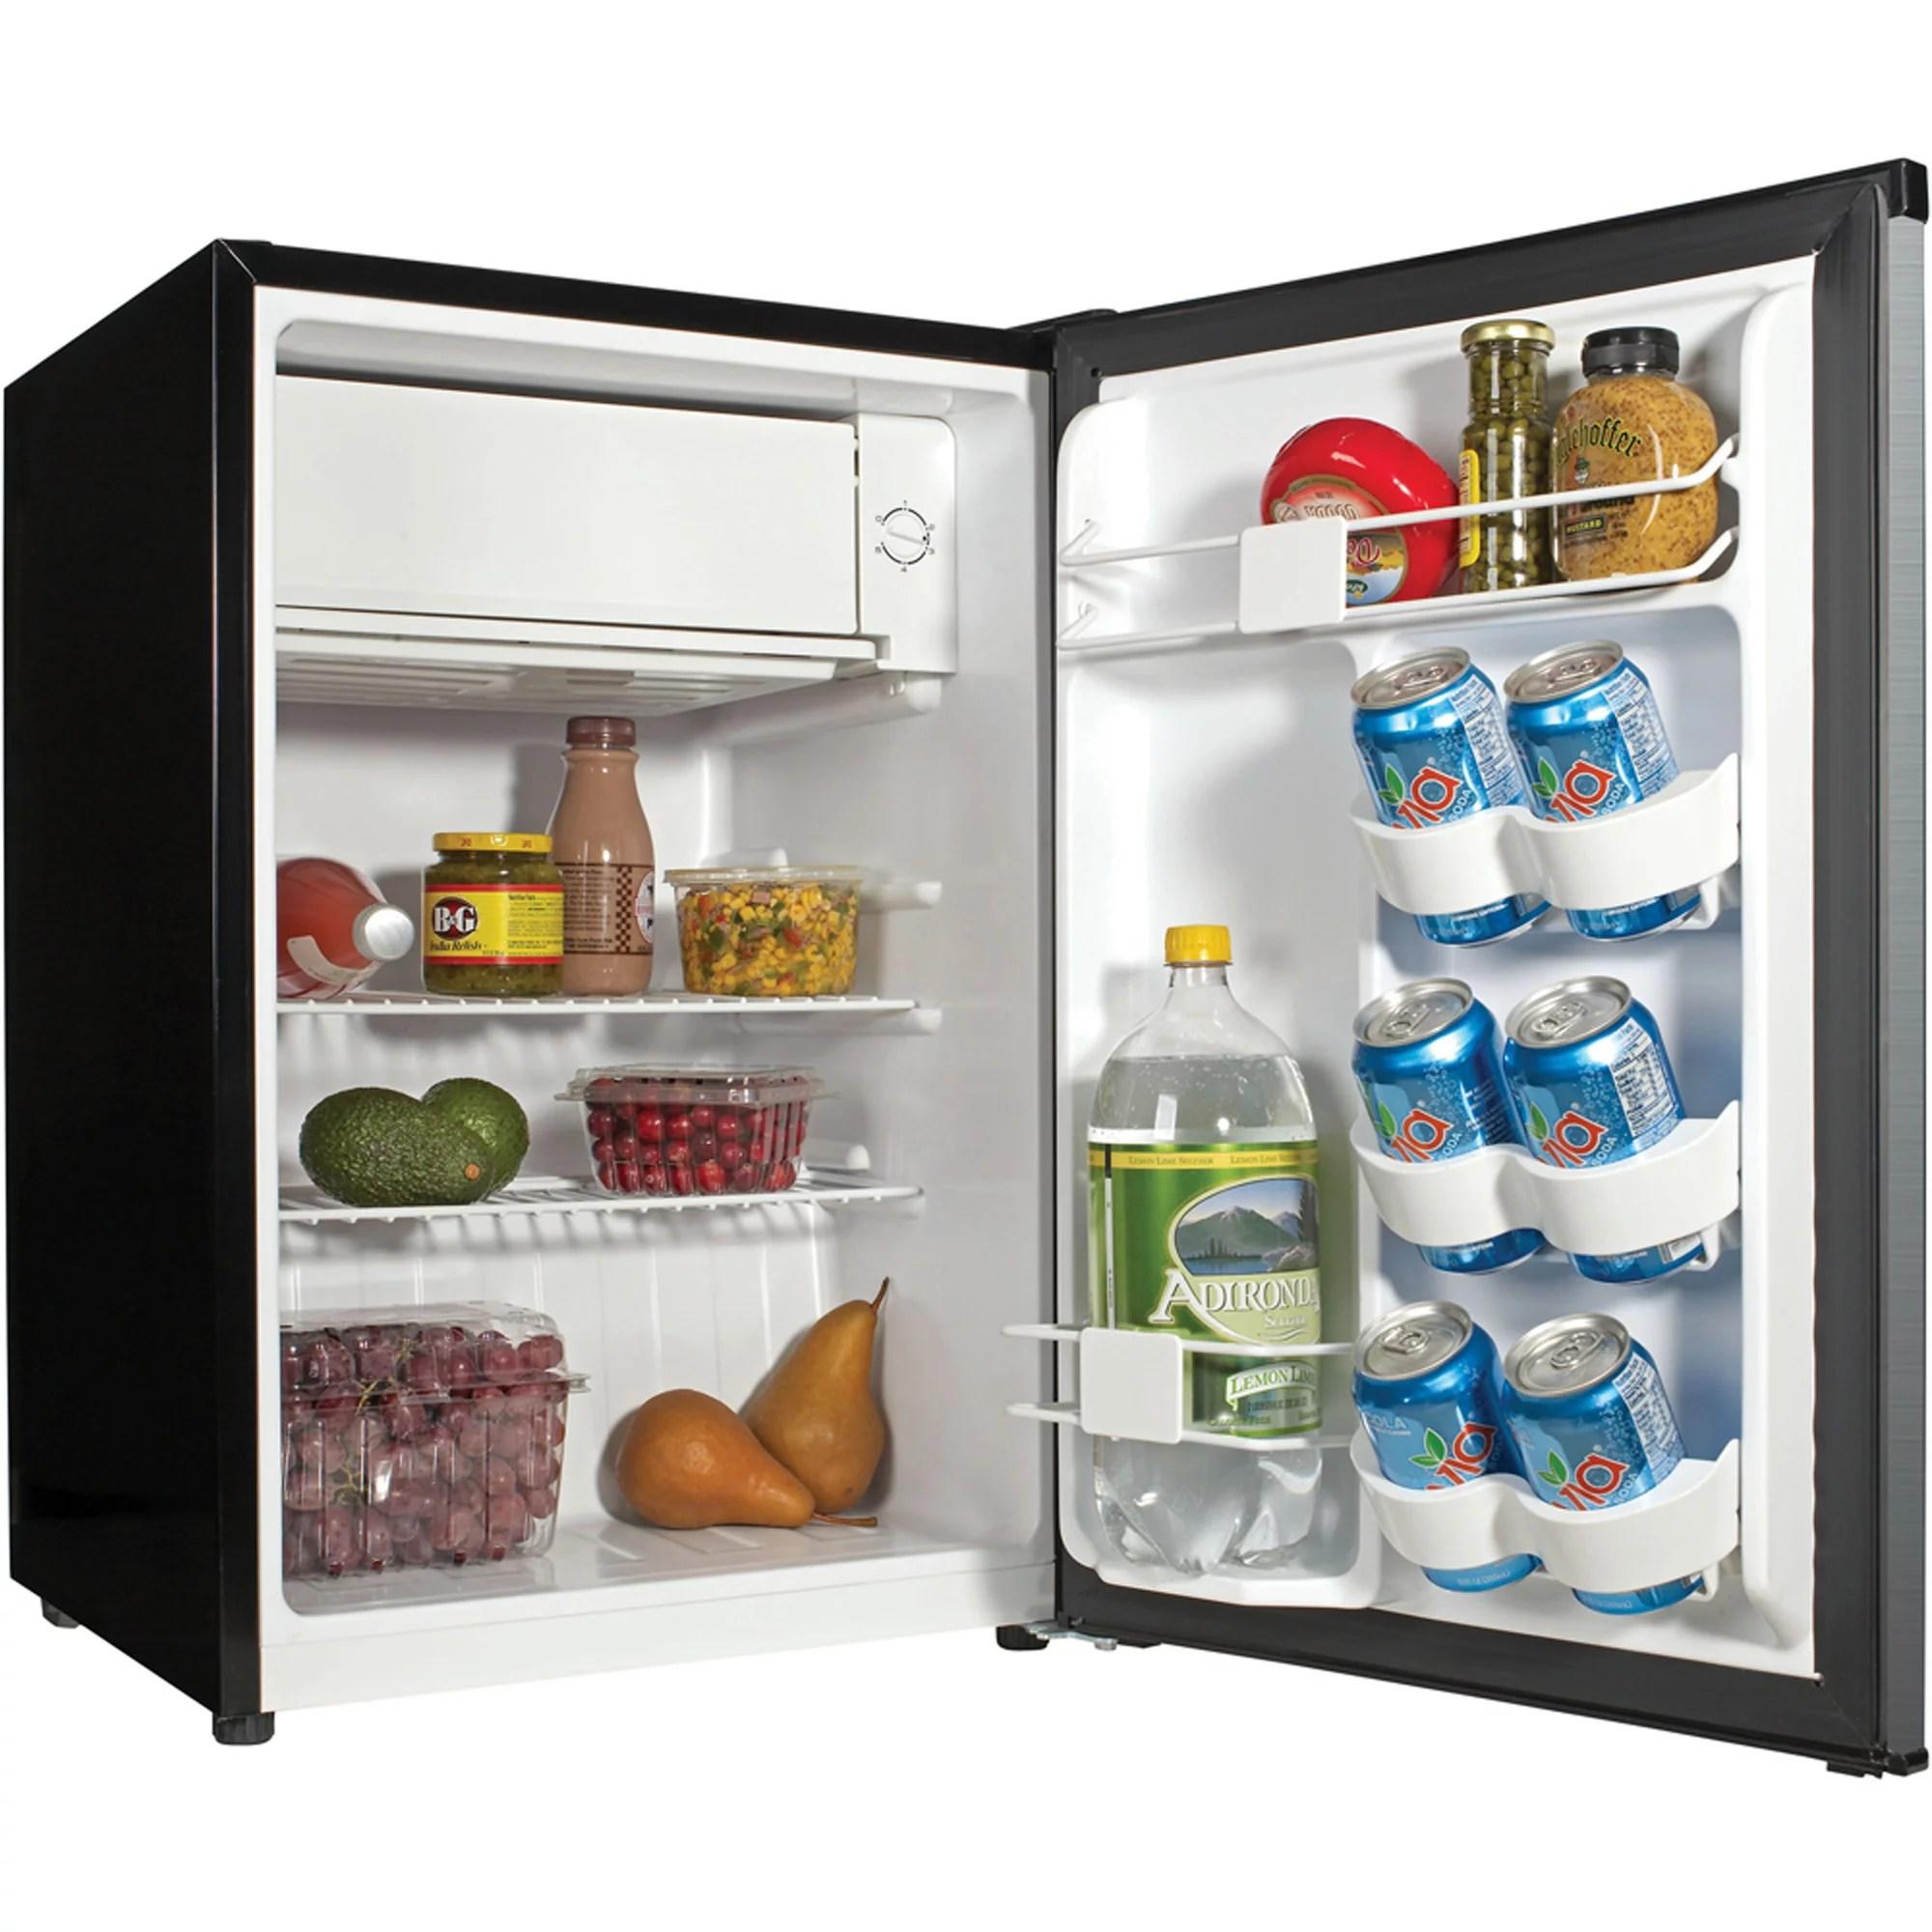 Mini Fridge Compact Steel Refrigerator 27 Cu Ft Dorm